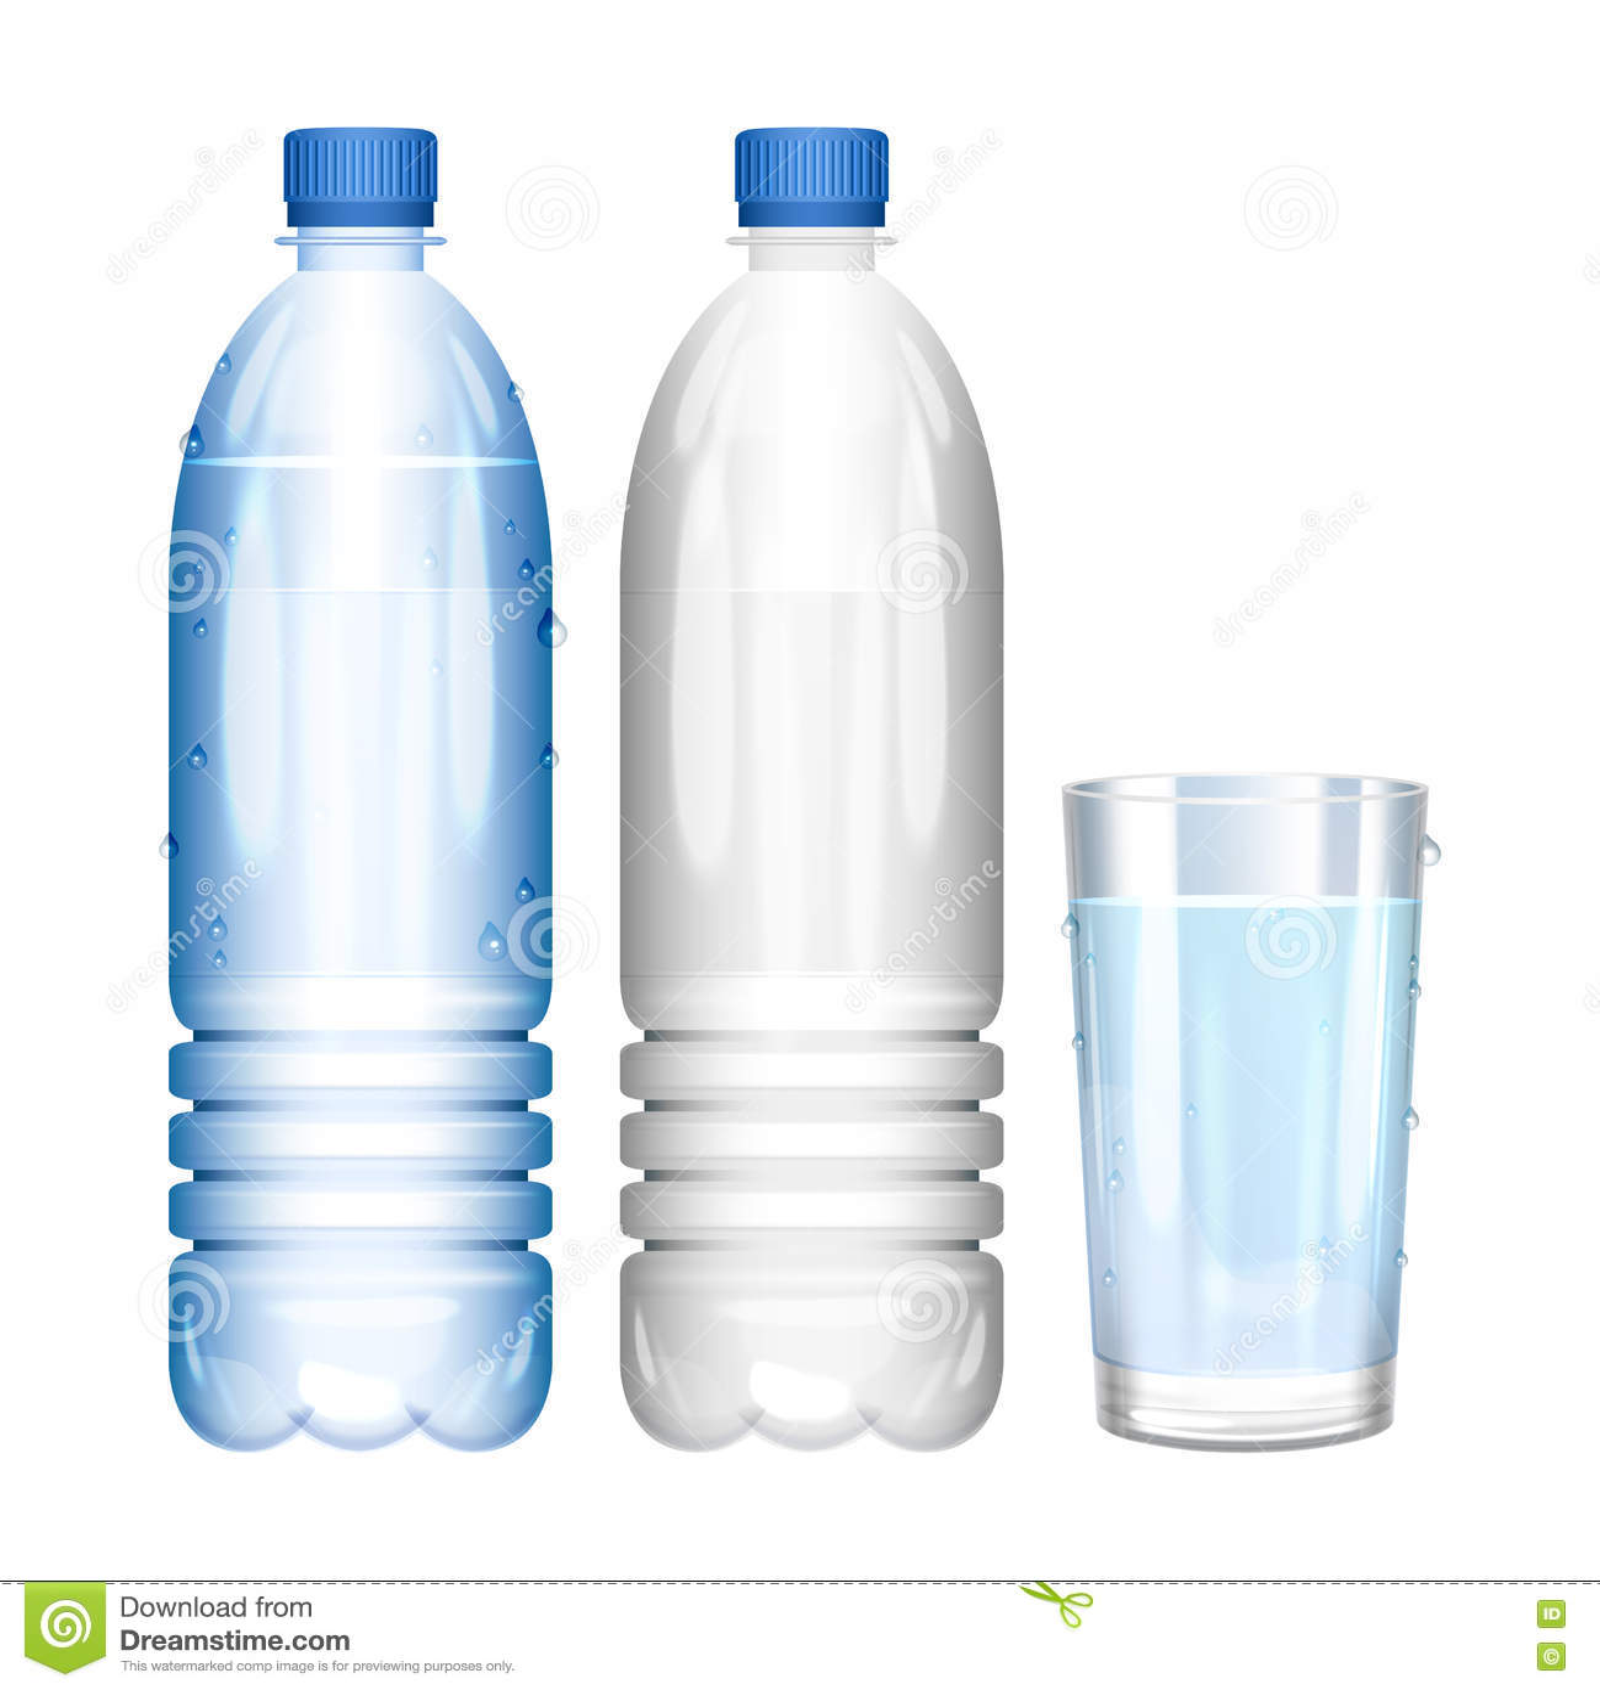 Water Bottle Vector: Water In Bottle. Glass Of Pure Water. Empty Bottle. Vector